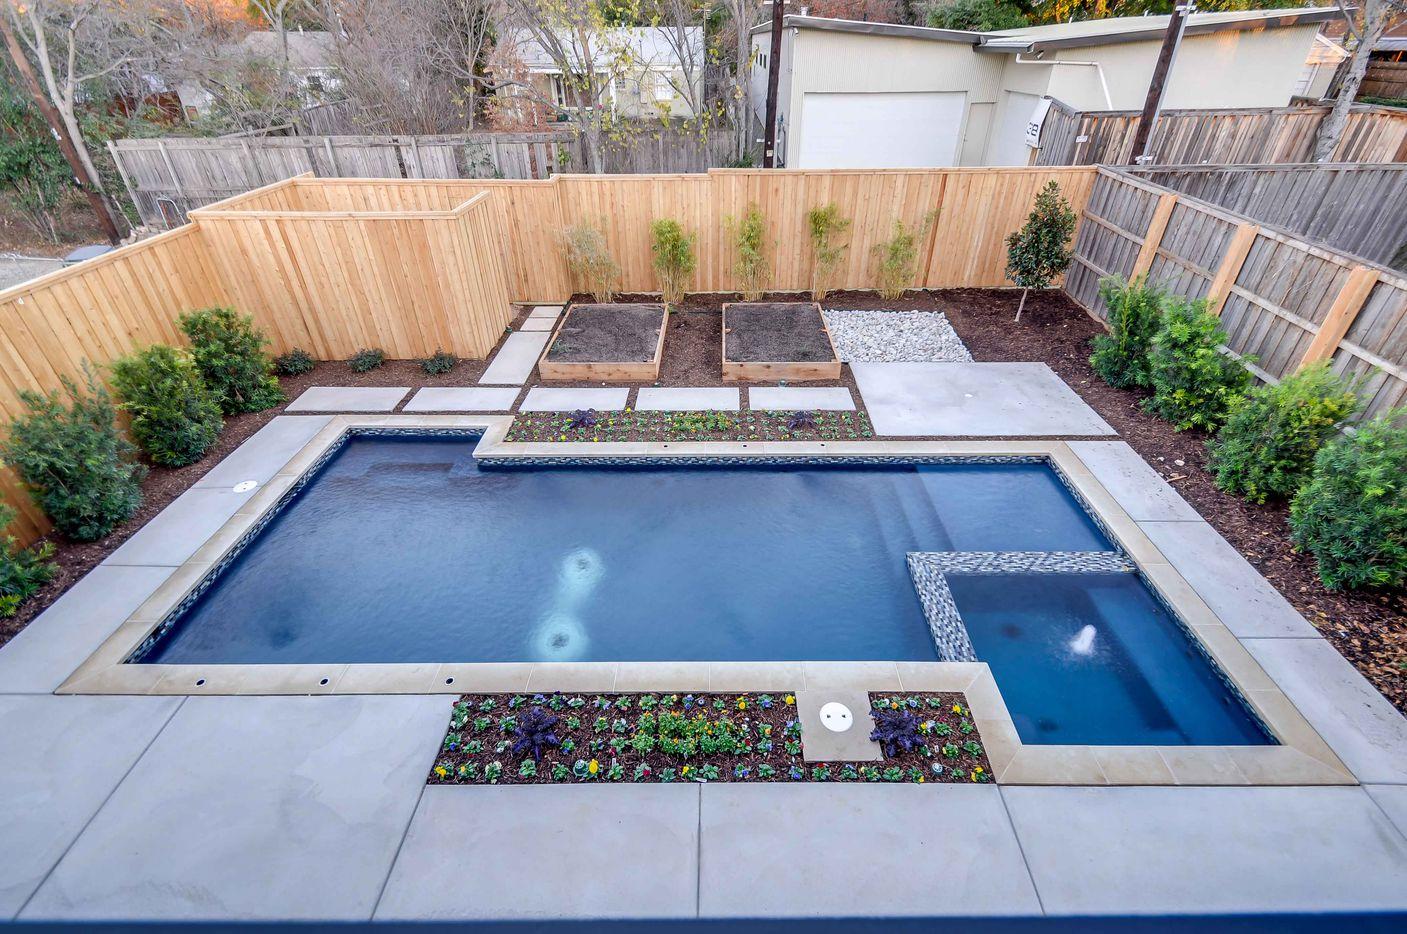 Classic Urban Homes Bluffview area house has a backyard pool.